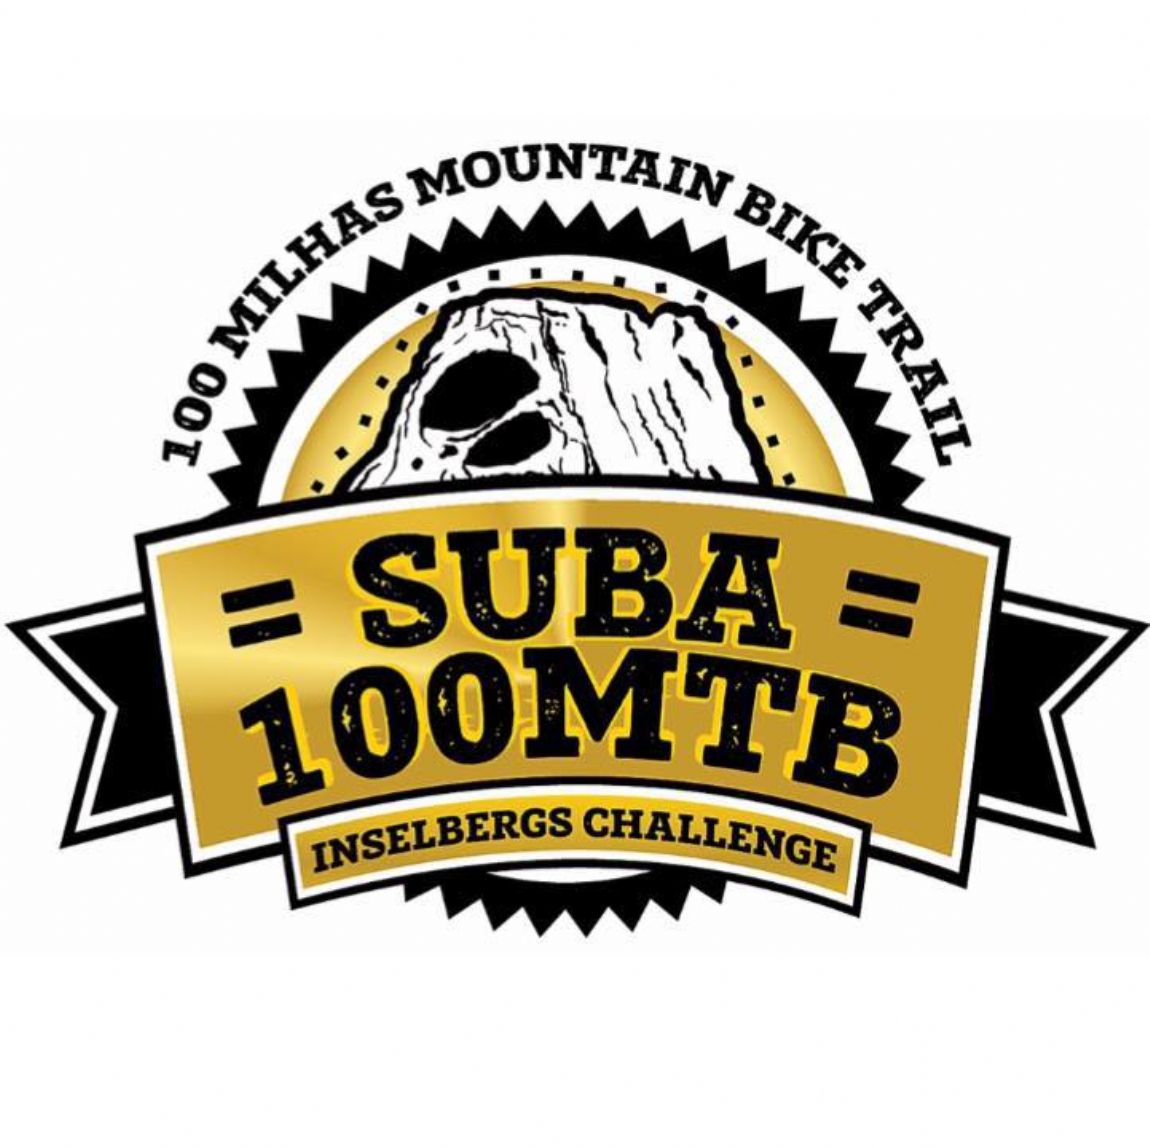 Competições MTB, Suba Challenge 2021